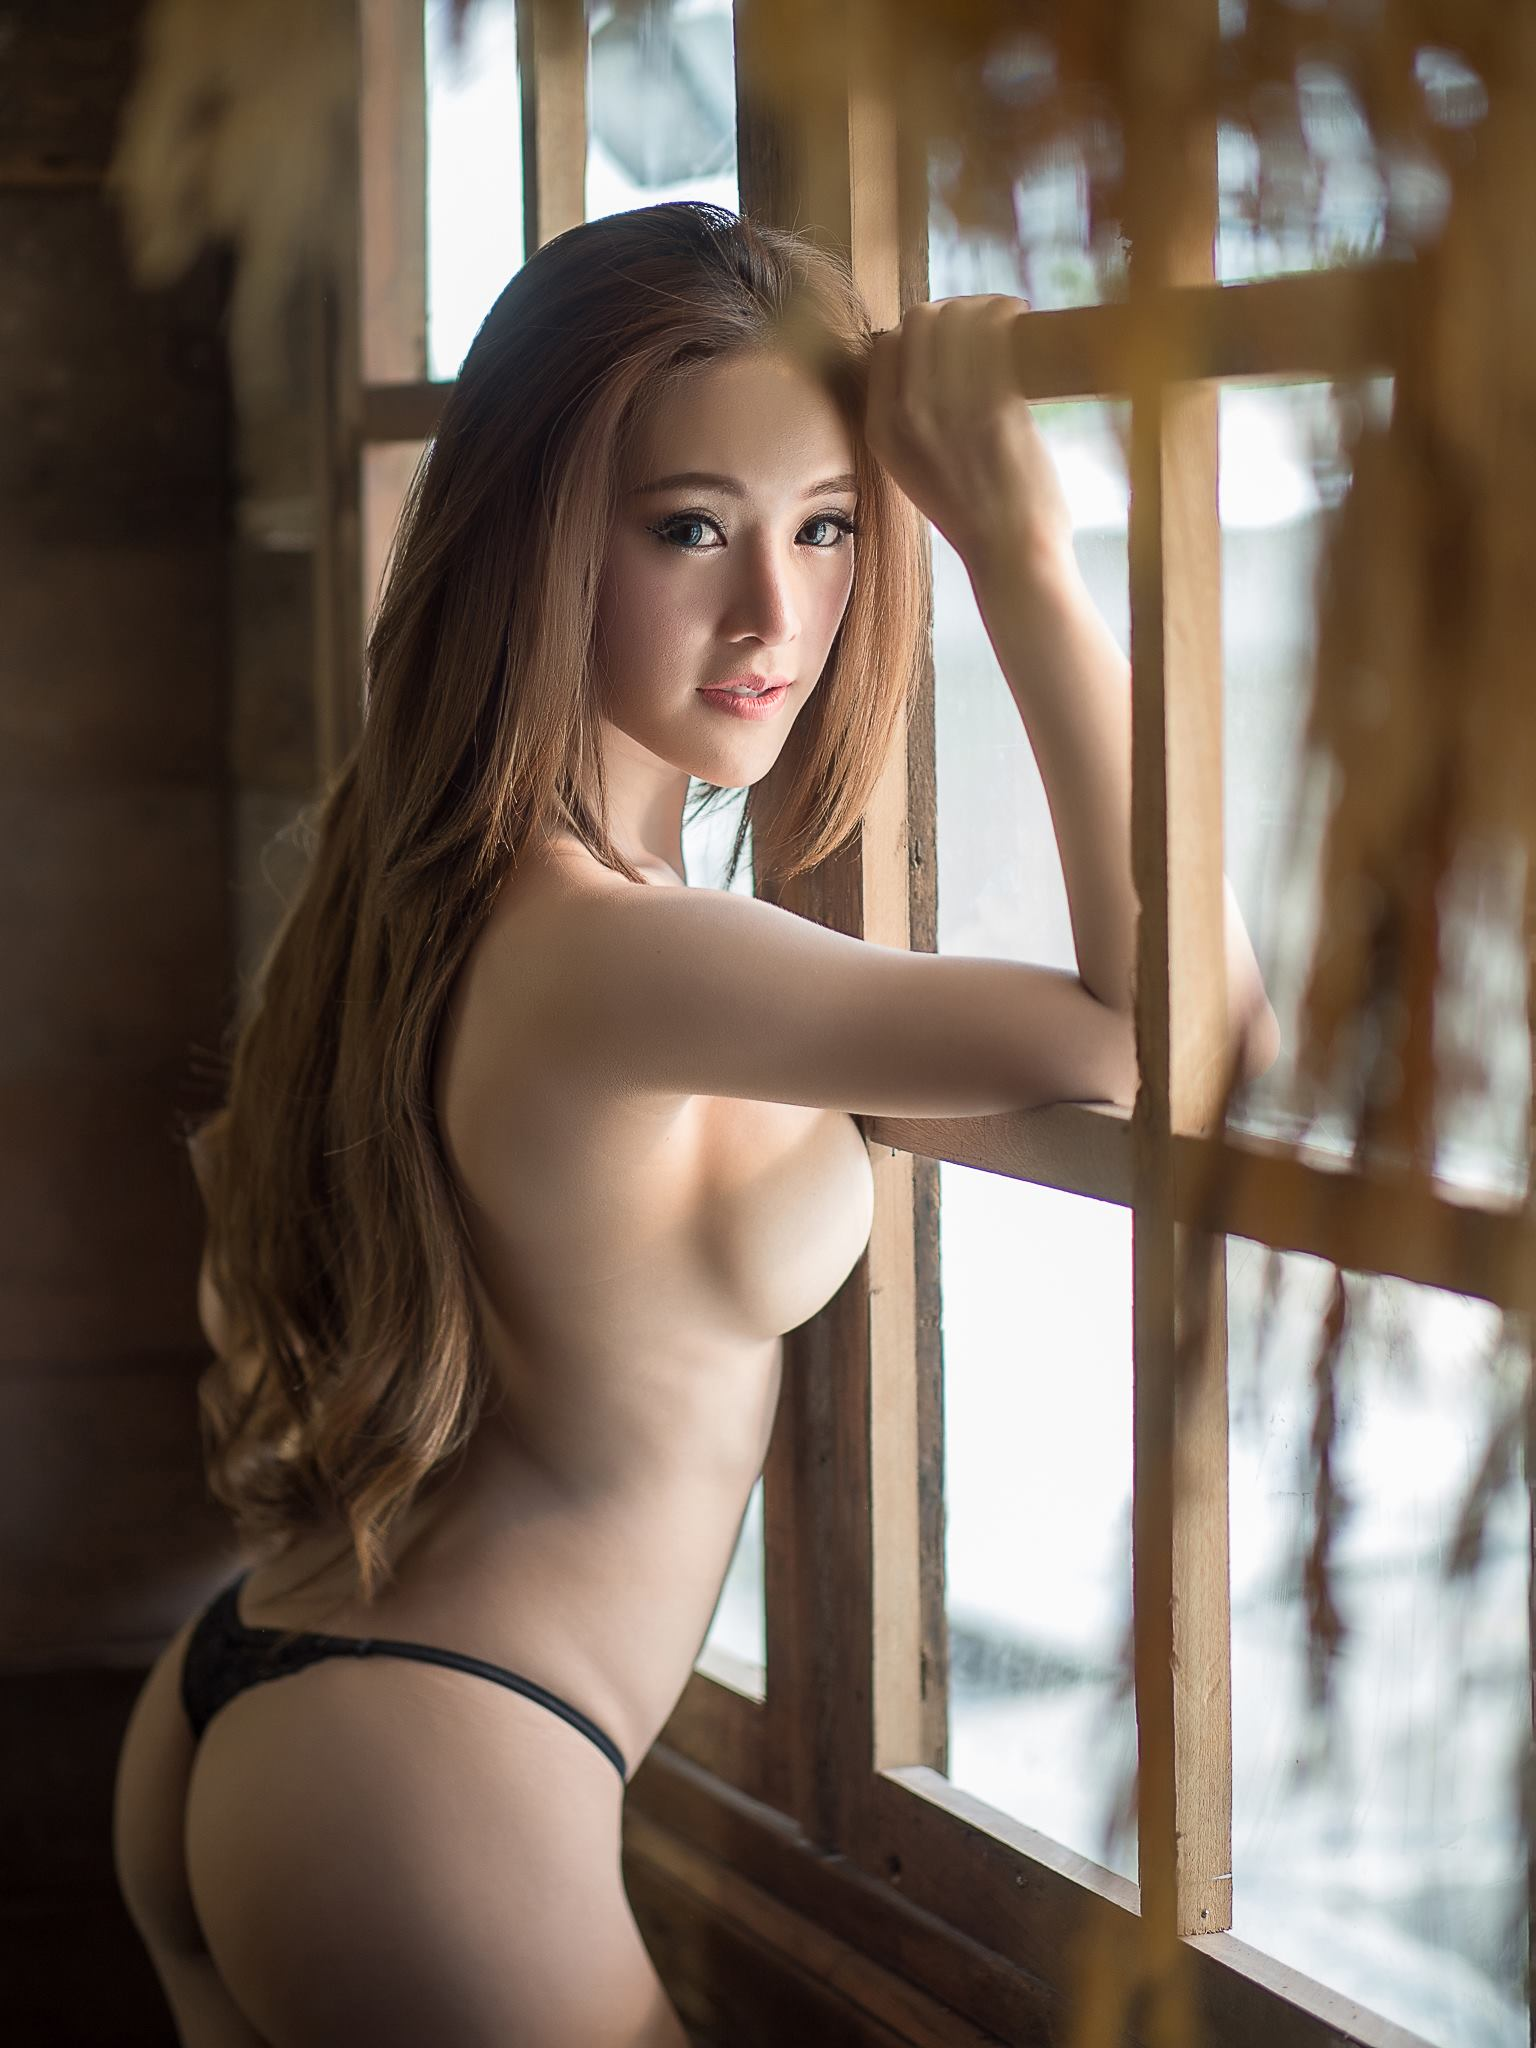 Topless - Chadaporn Chaithep